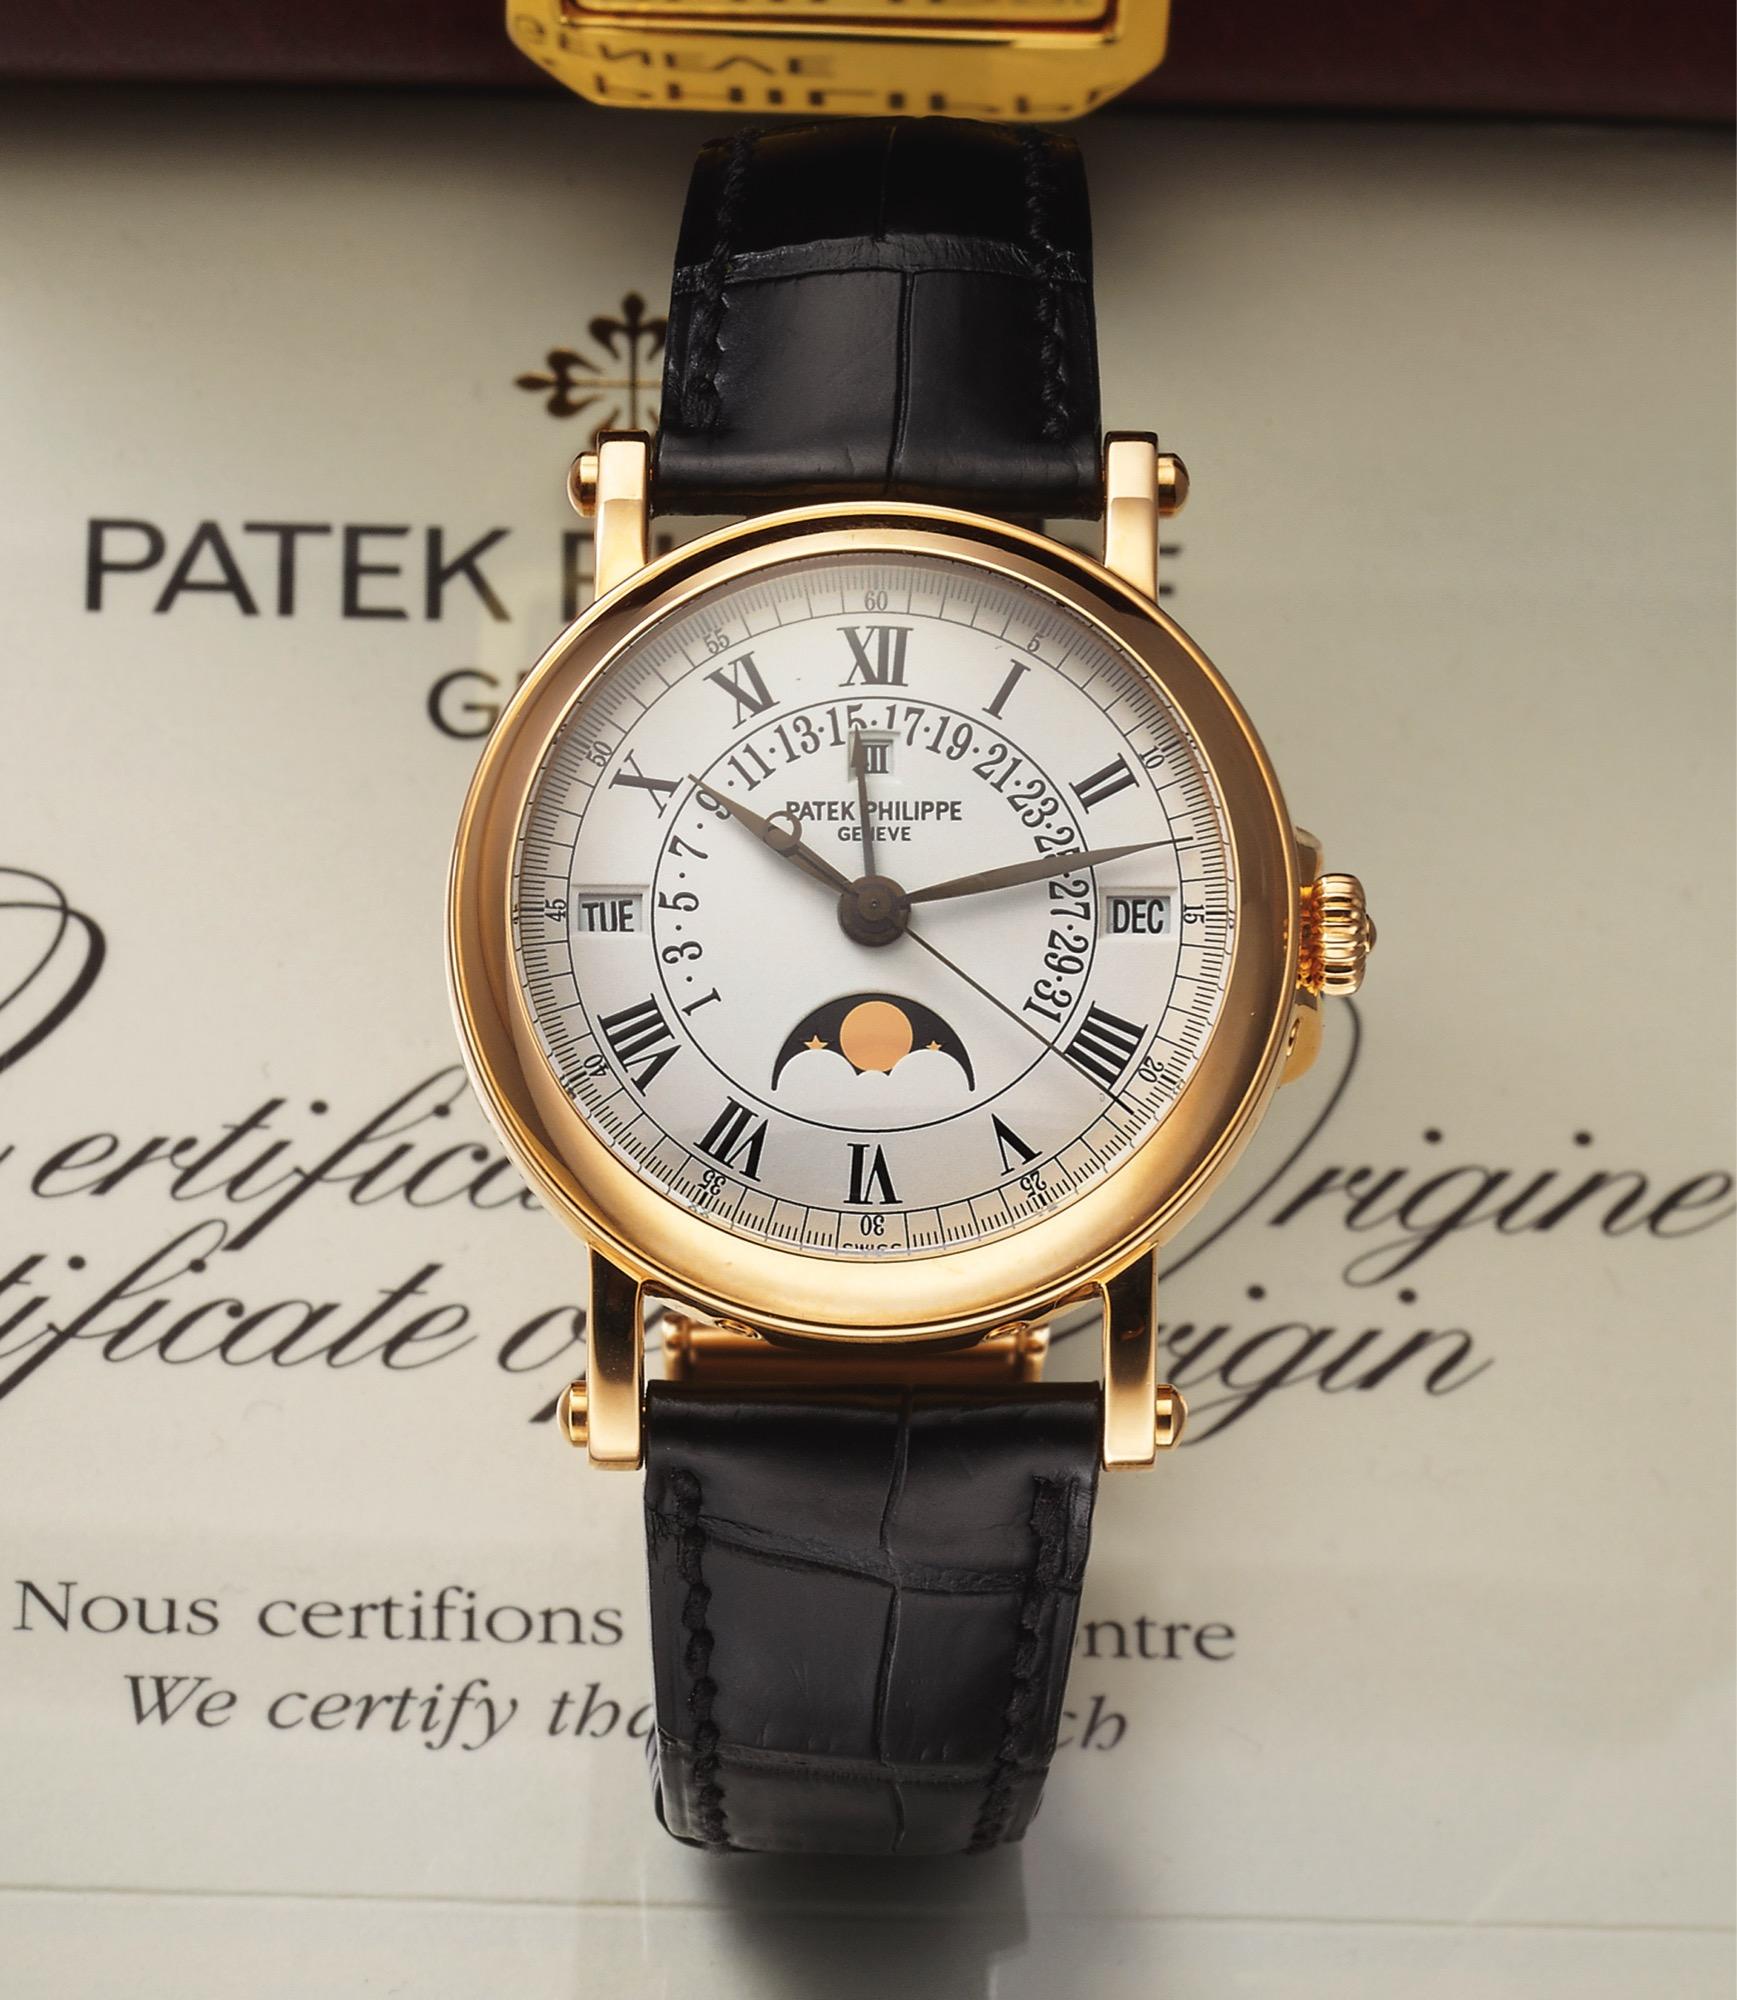 Золотые часы Patek Philippe, оригинал